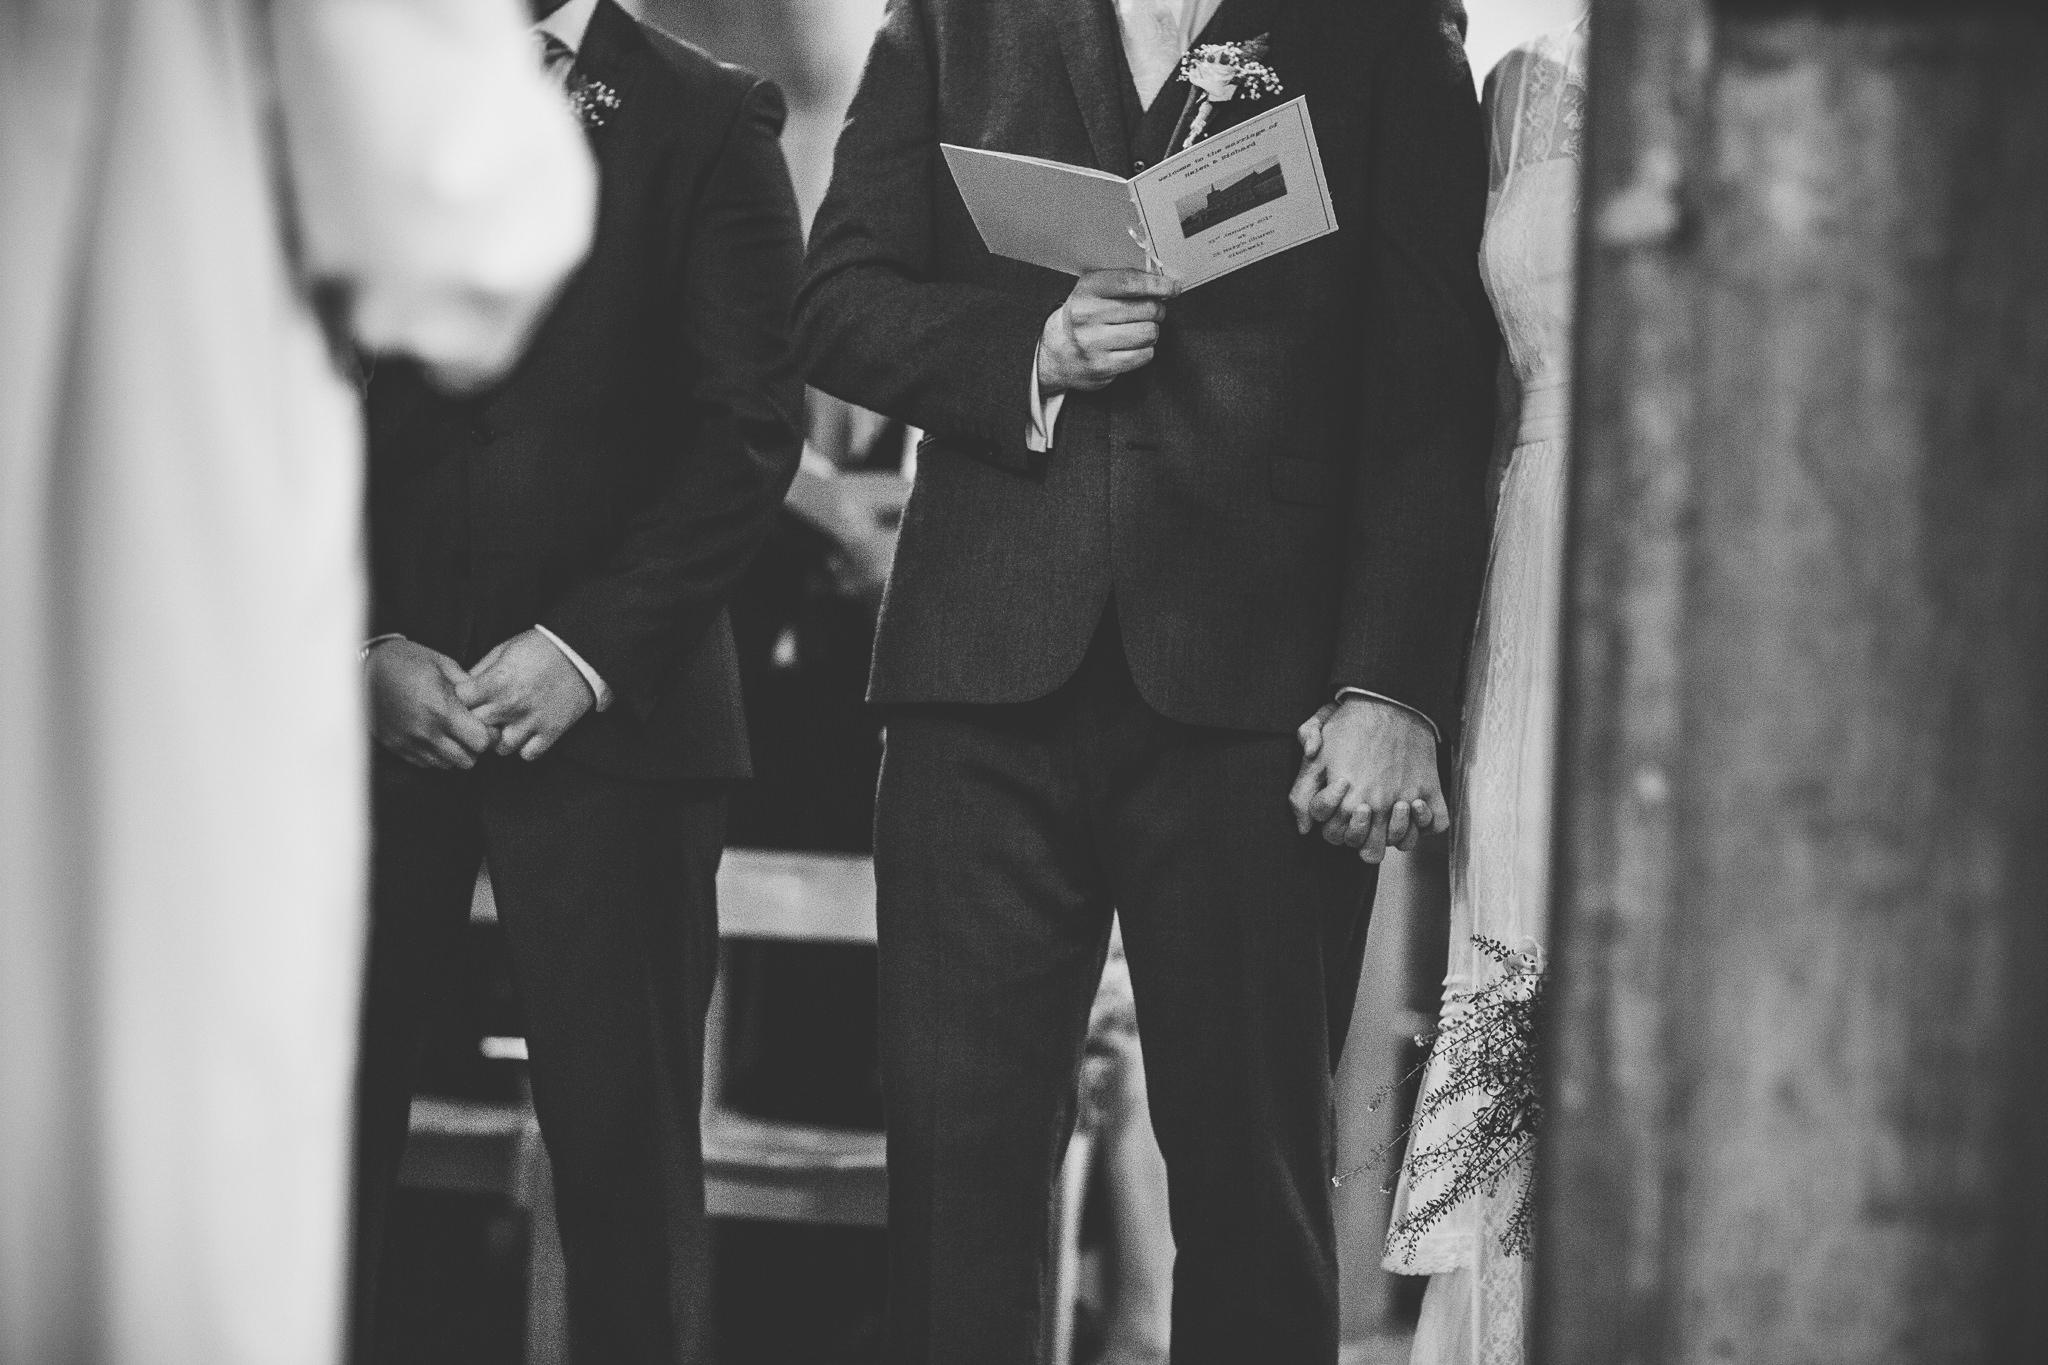 Creative-reportage-wedding-photography-90021